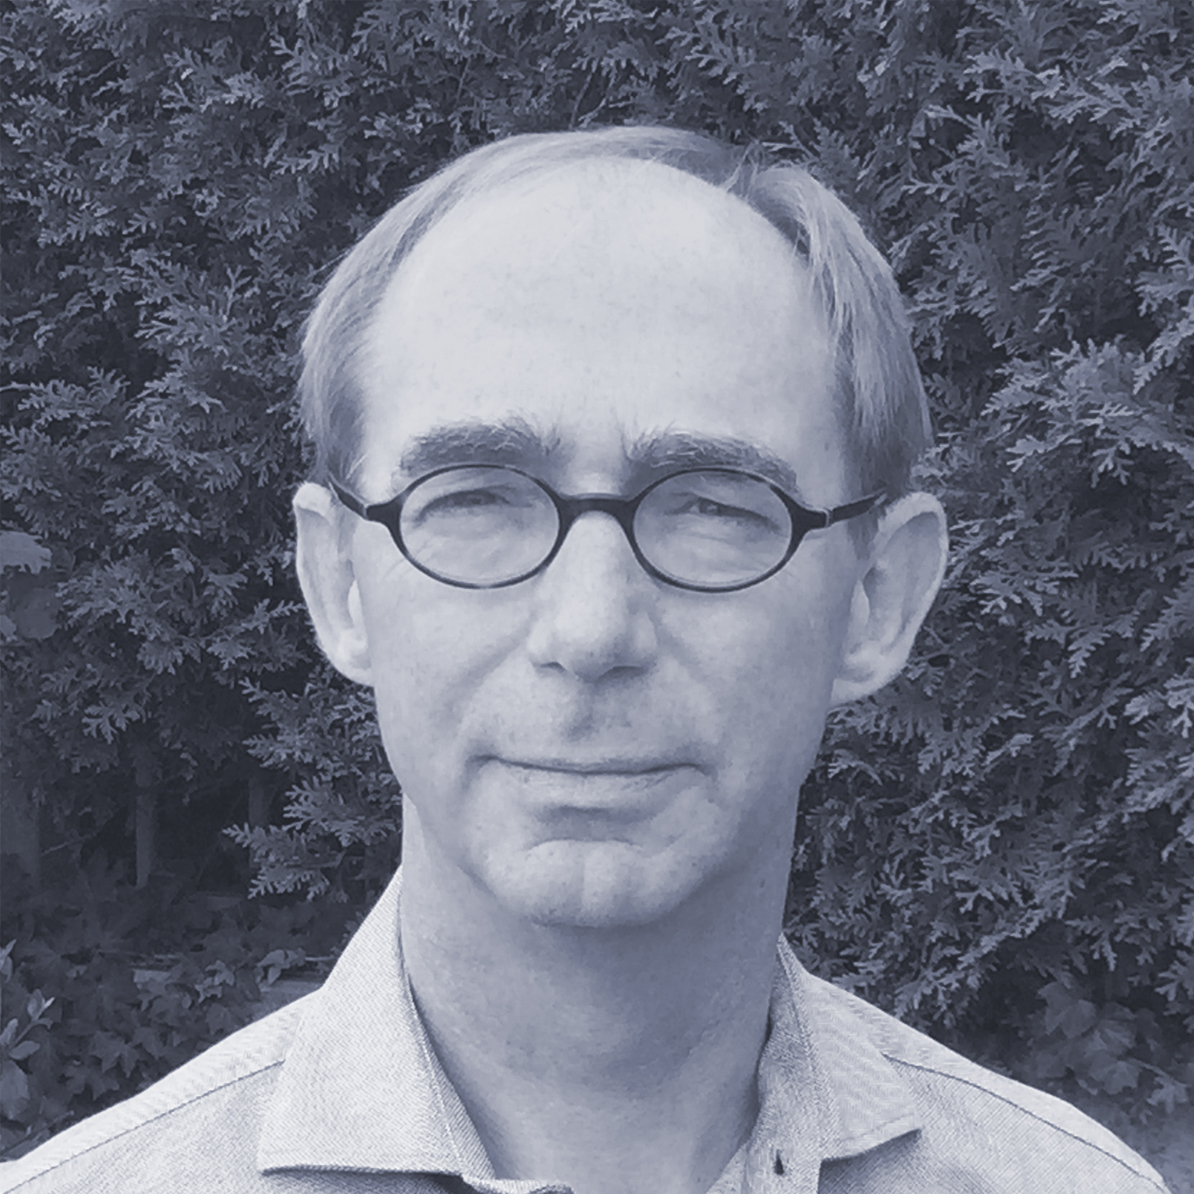 Boris Stam